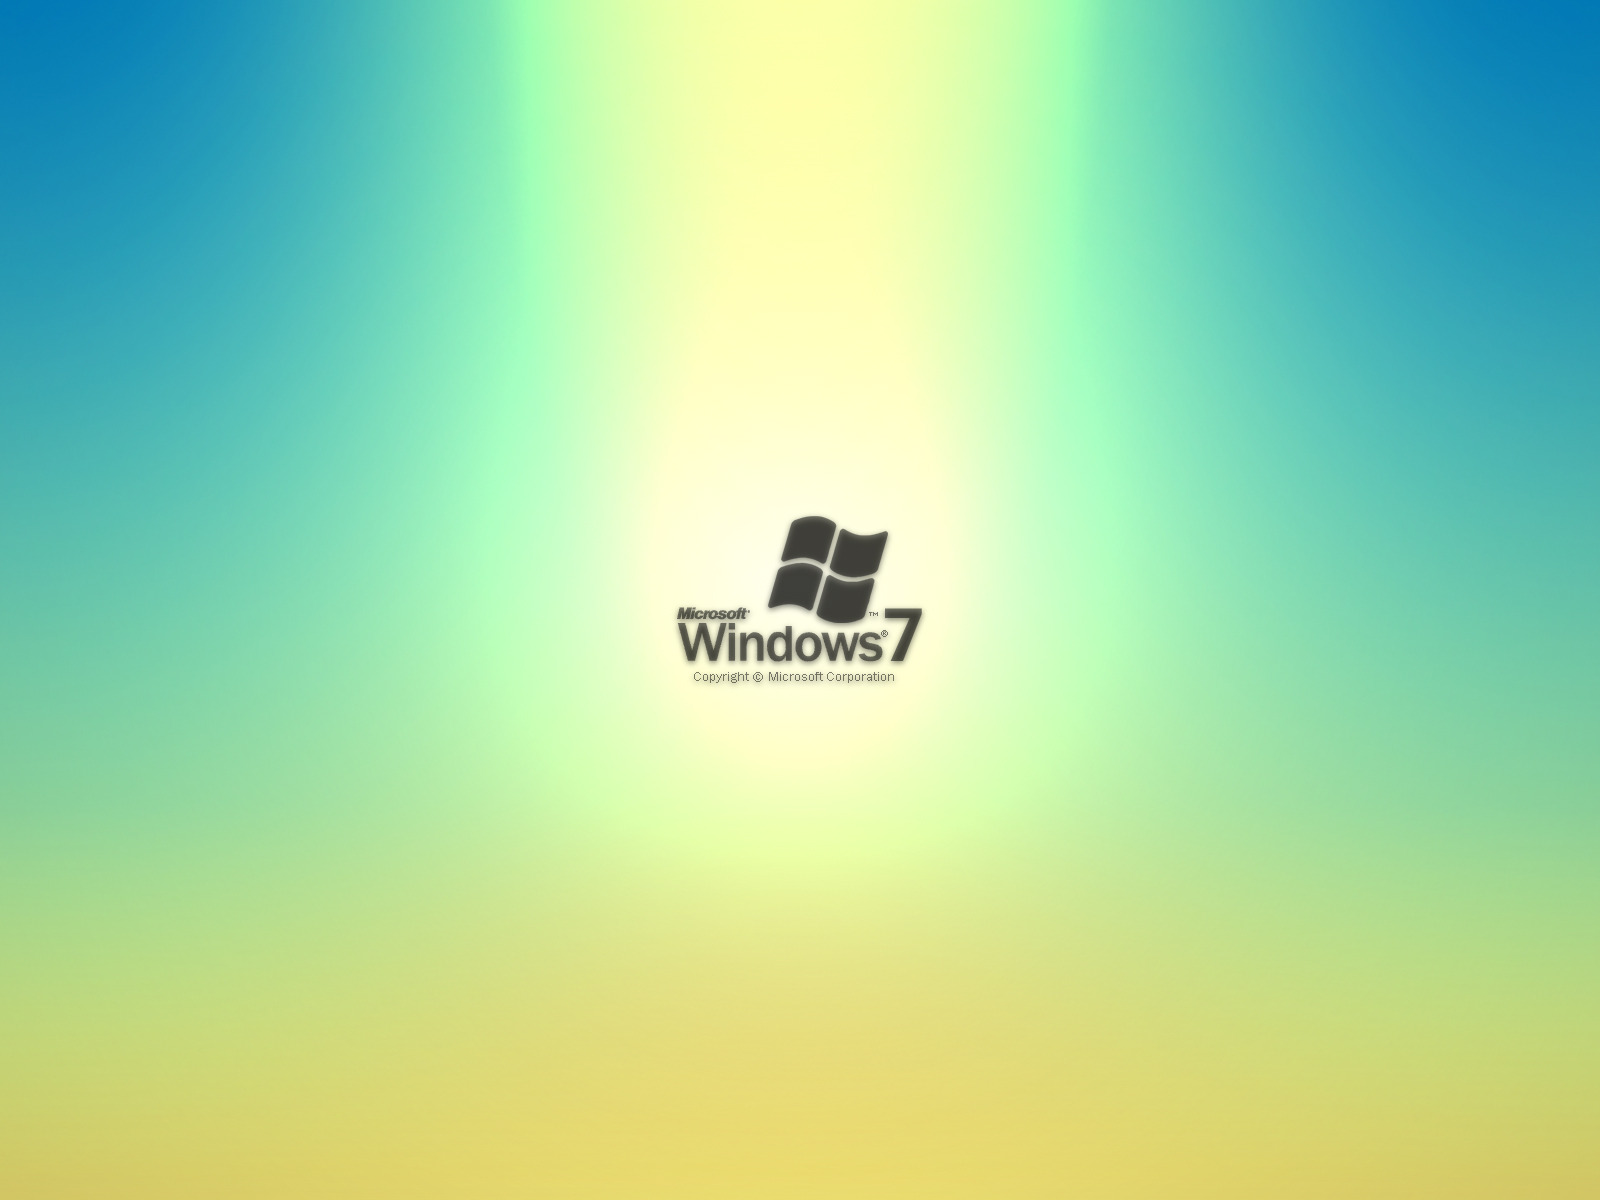 Wallpaper PC Kreatifitasdircom